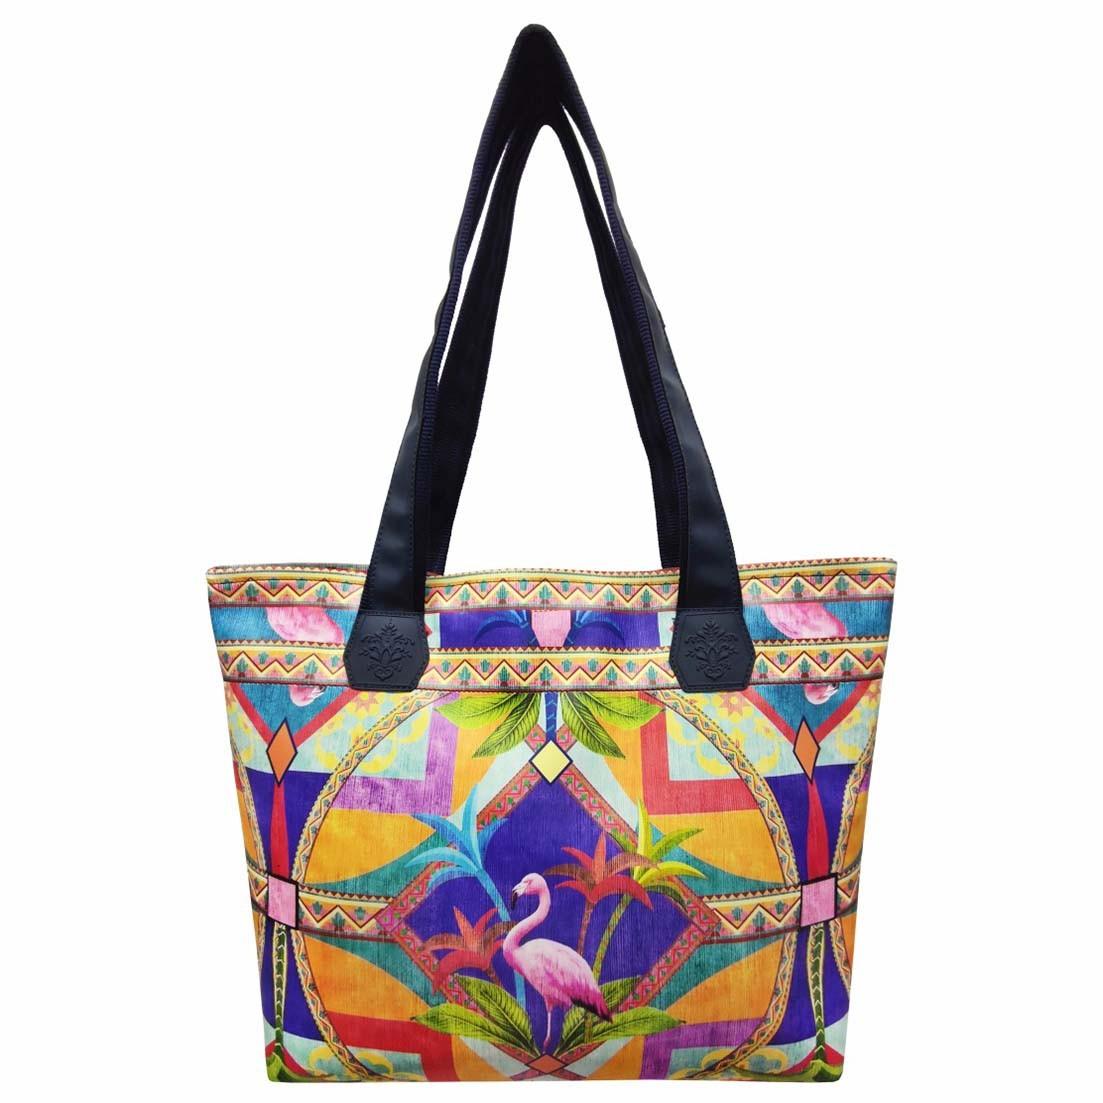 Bolsa Tropical Feminina  Geométrica, Magicc